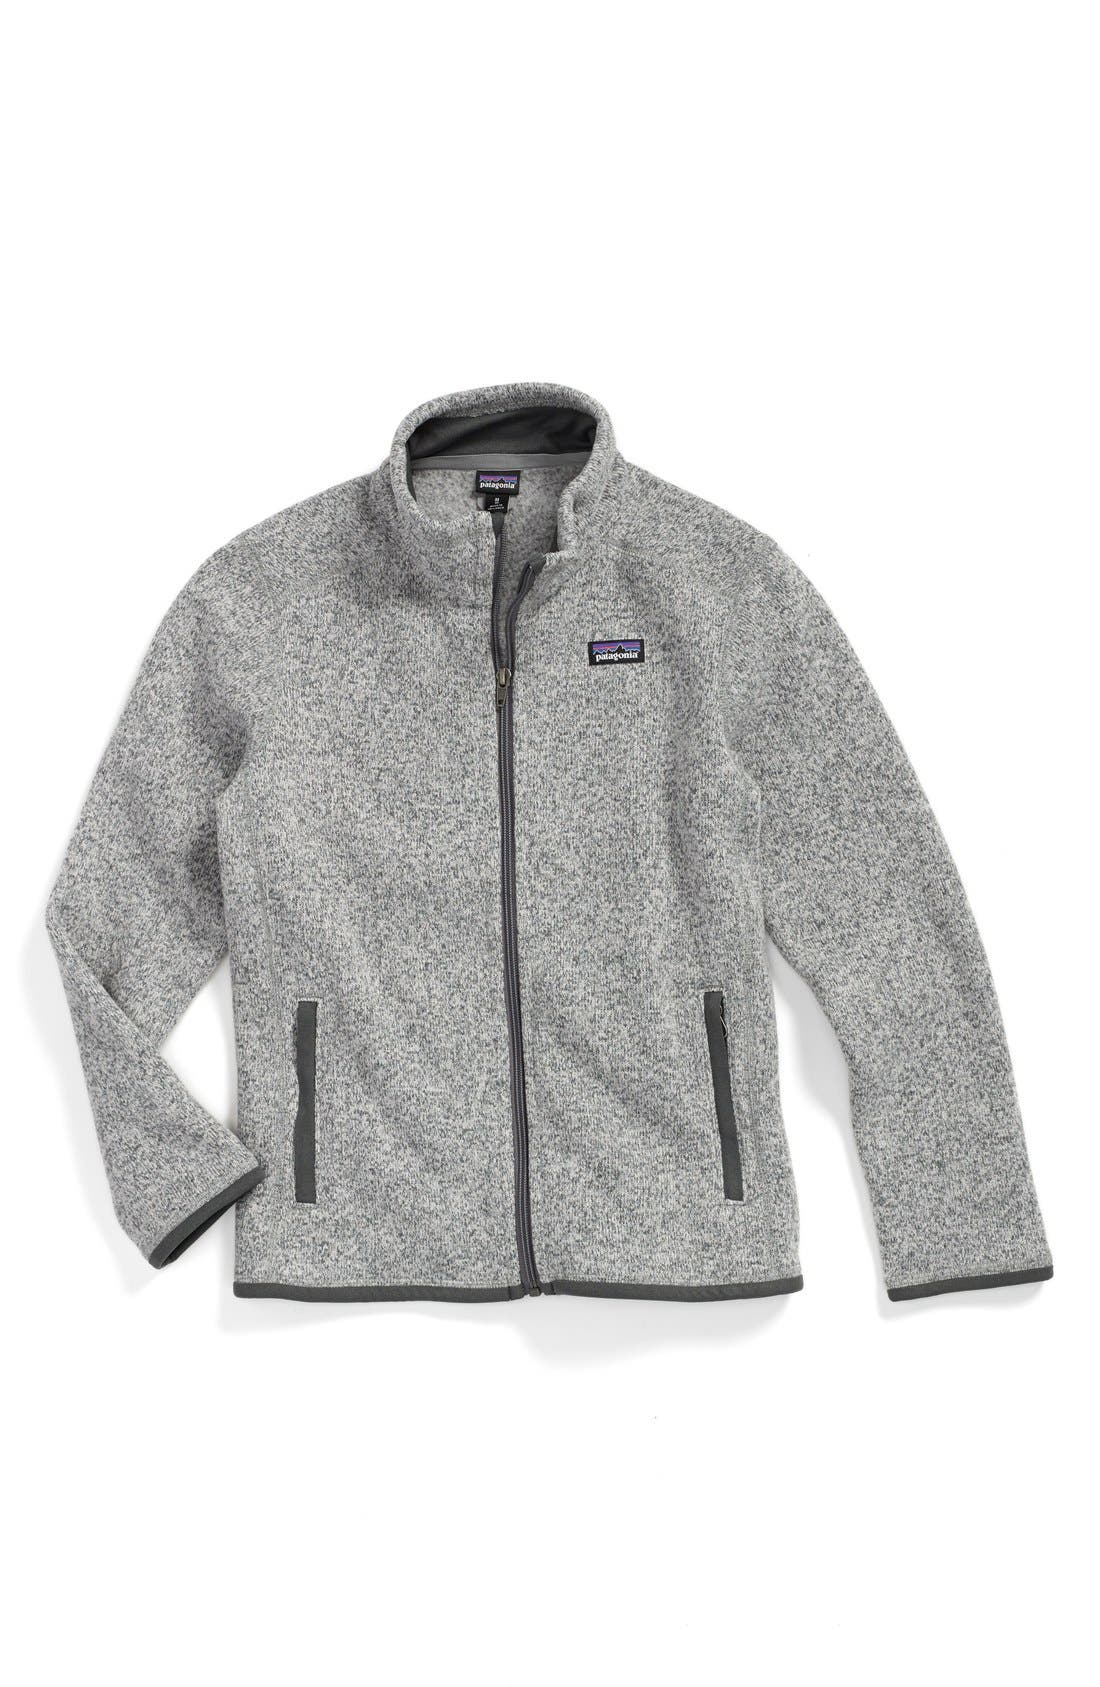 Better Sweater Jacket,                             Main thumbnail 1, color,                             STONEWASH GREY